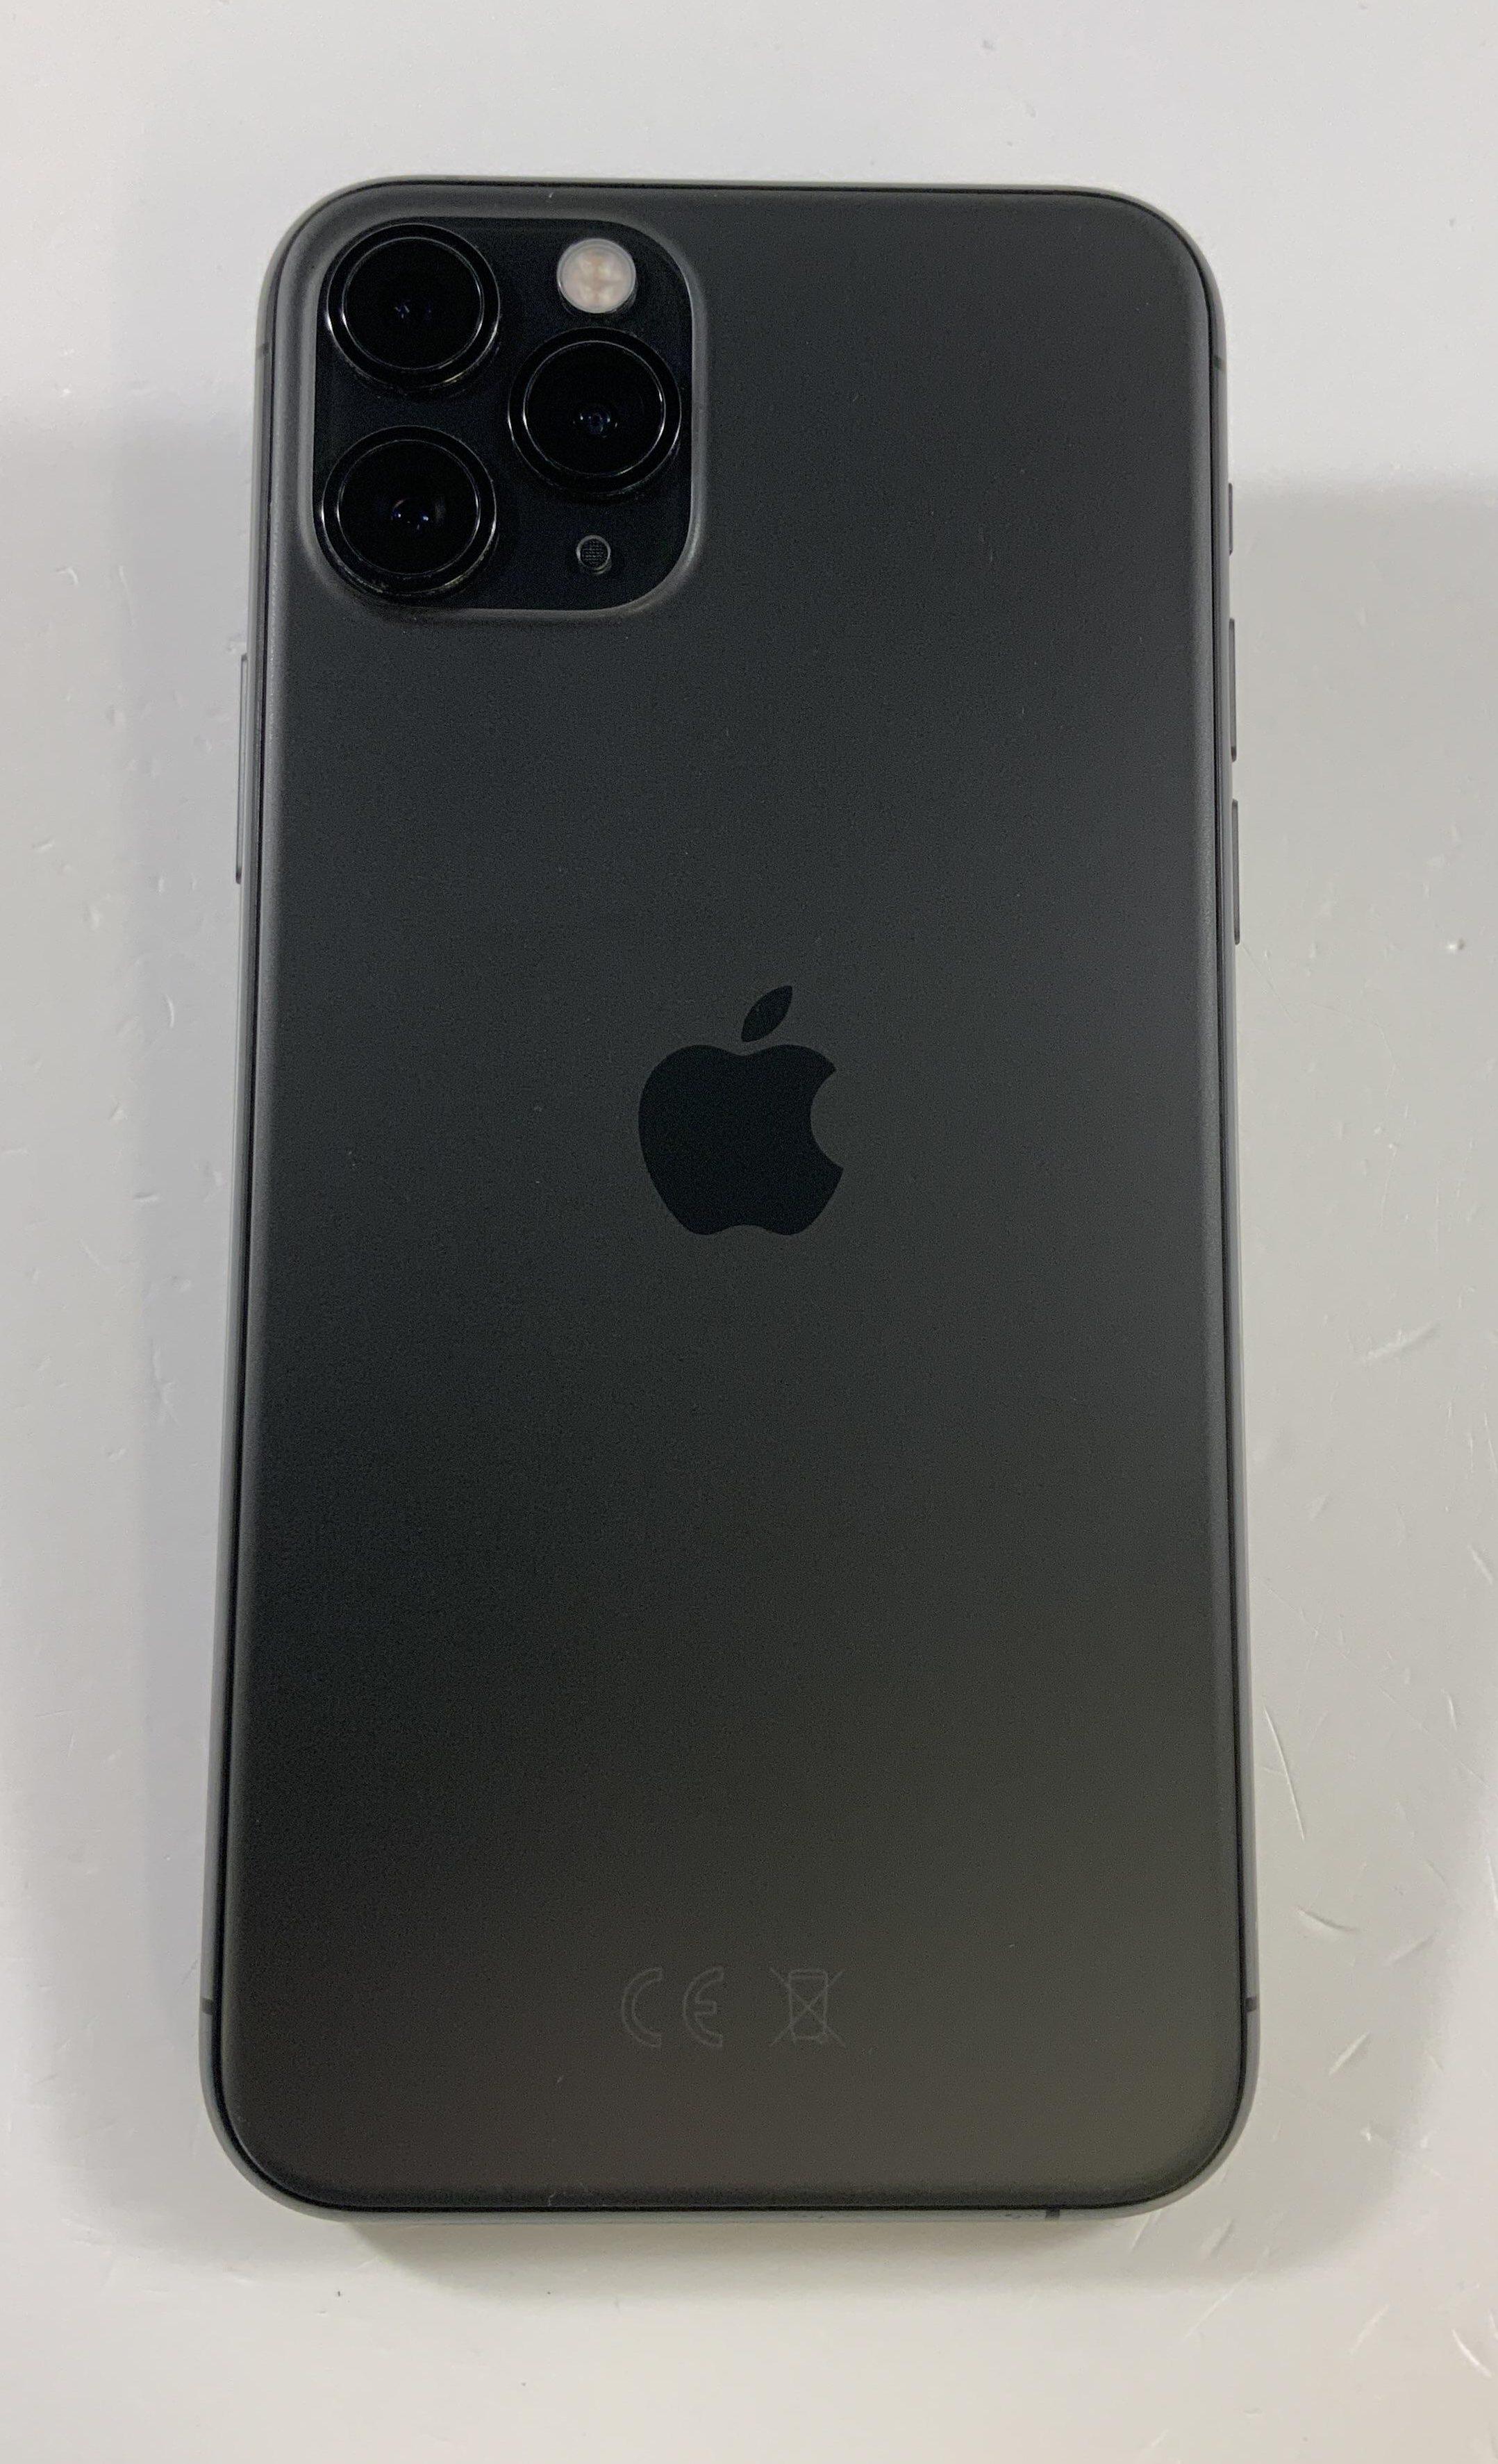 iPhone 11 Pro 256GB, 256GB, Space Gray, imagen 2